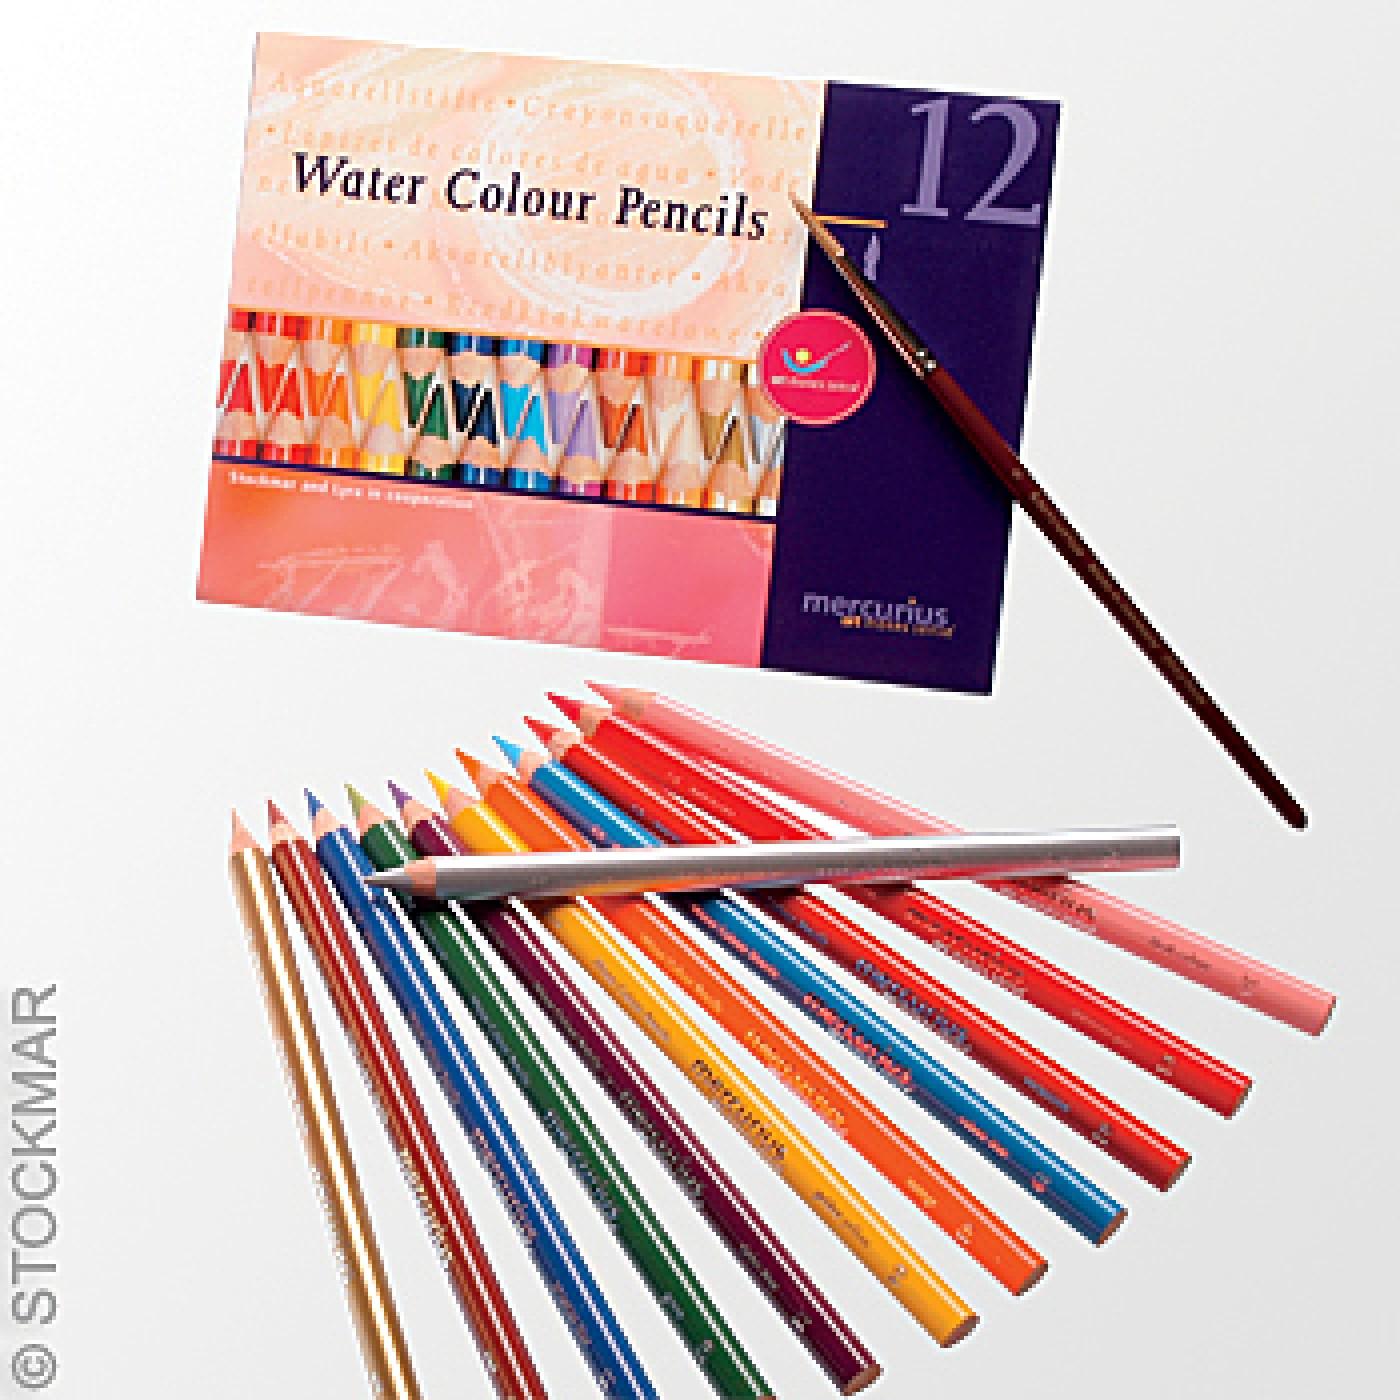 Stockmar Water Color Pencils - 12 Asst Colors